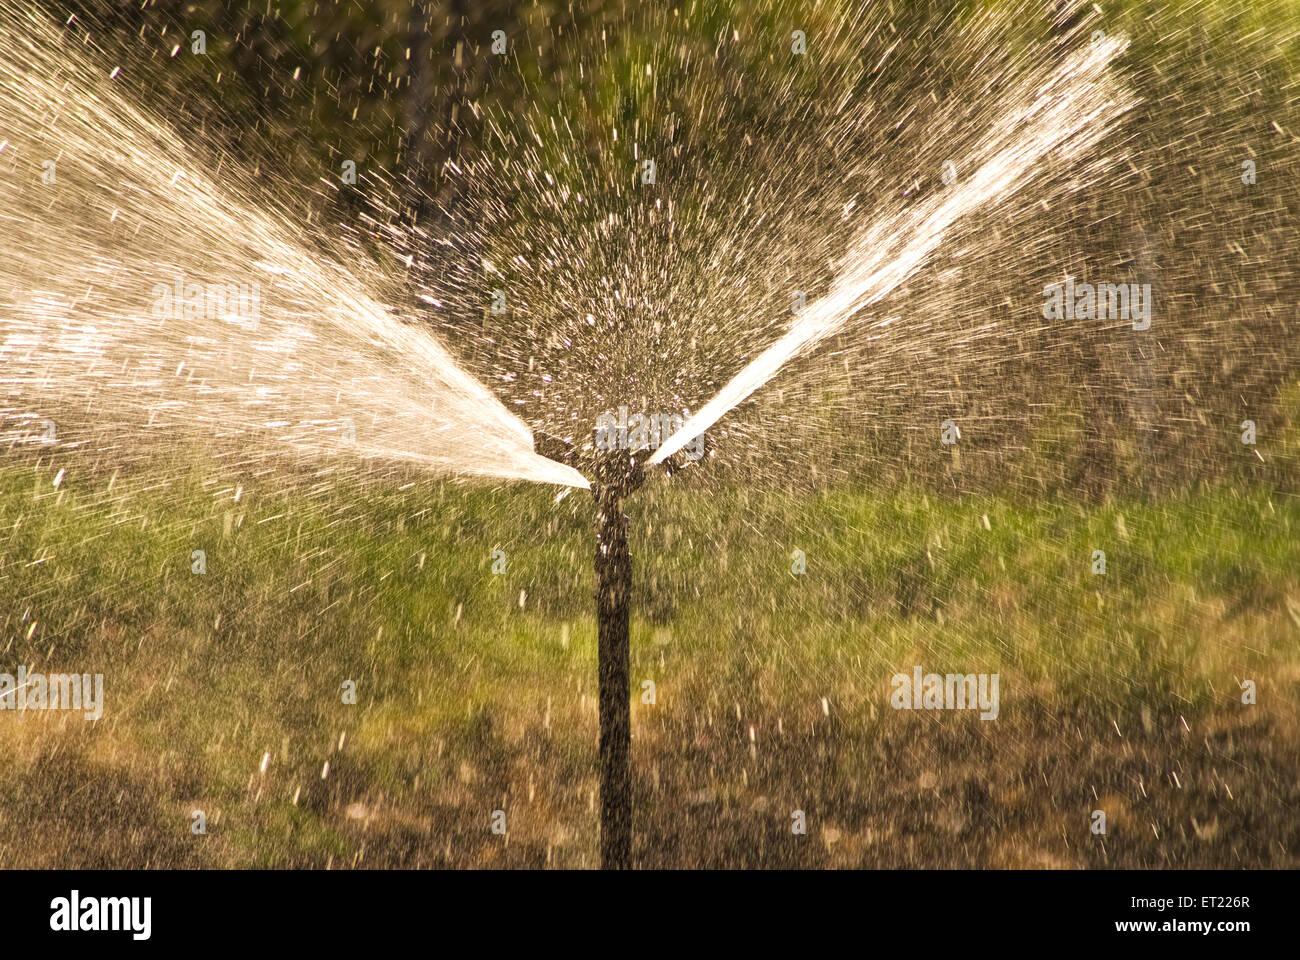 Sprinkler irrigation ; Padhegaon ; Ahmadnagar ; Maharashtra ; India February 2009 - Stock Image